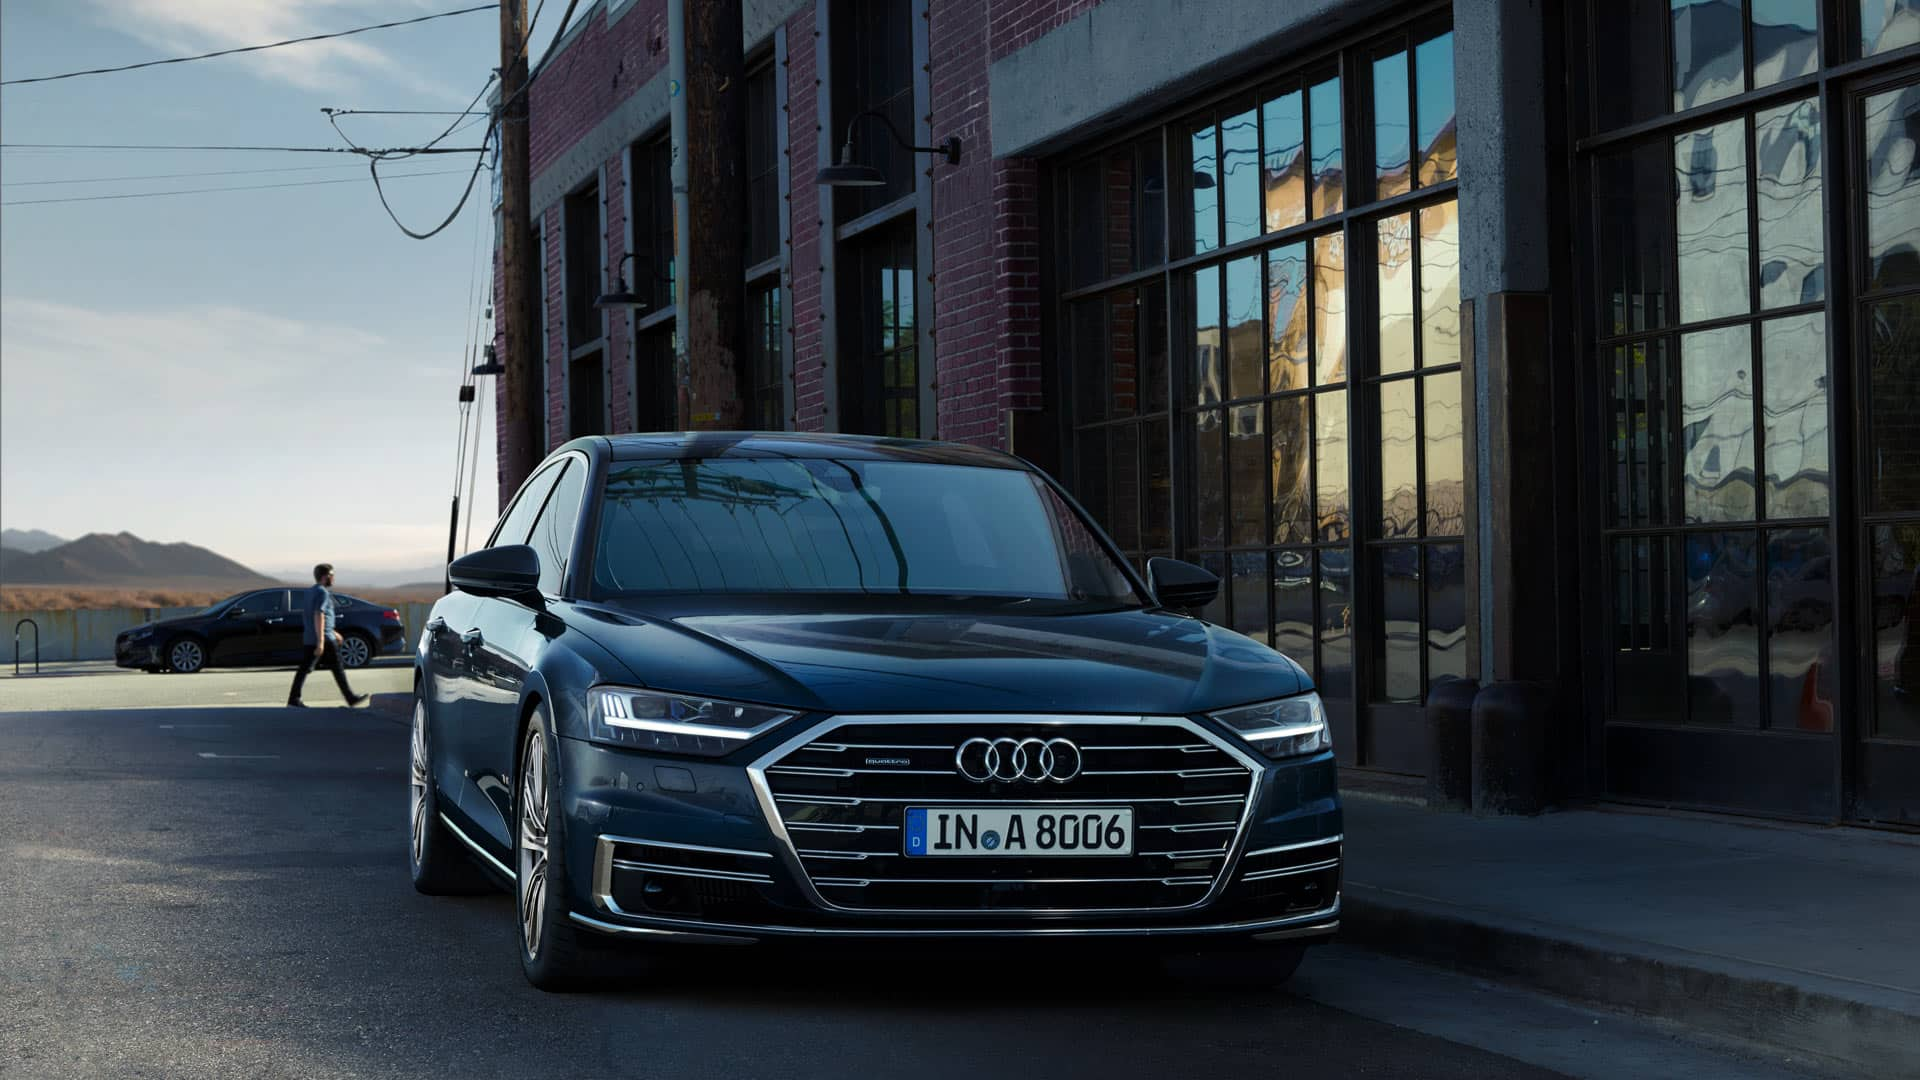 Audi A Future Of Luxury Audi Australia A Audi Australia - Audi a8 2018